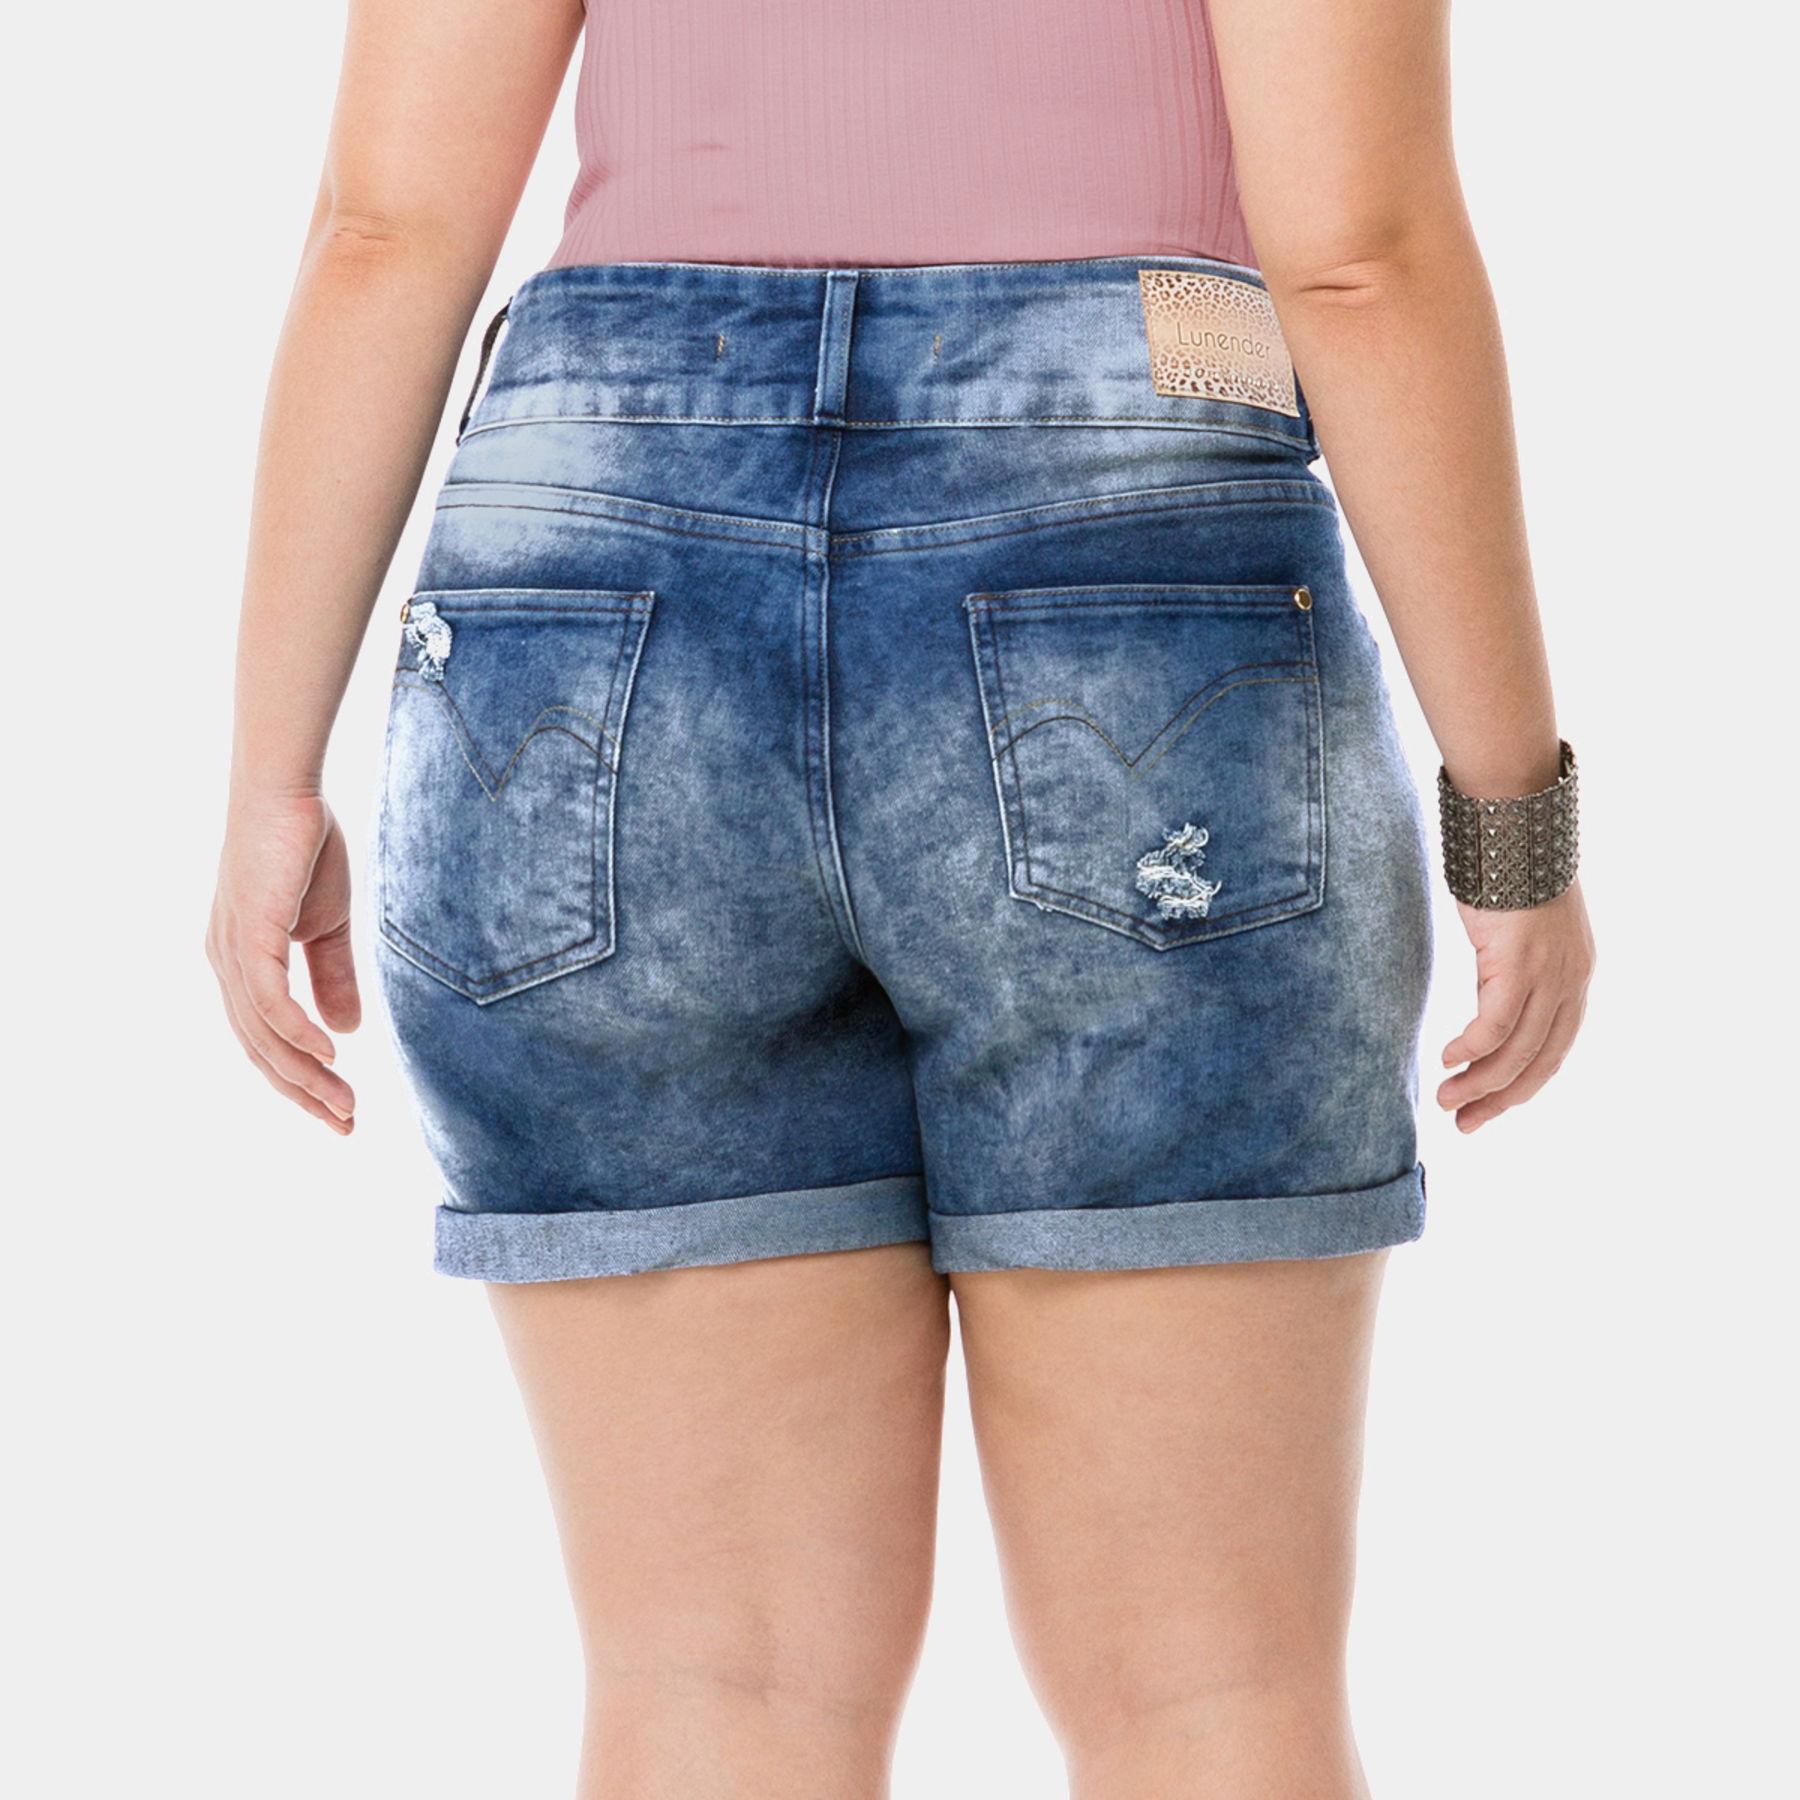 5cad3f732 Bermuda Boyfriend Jeans Claro - Mais Mulher